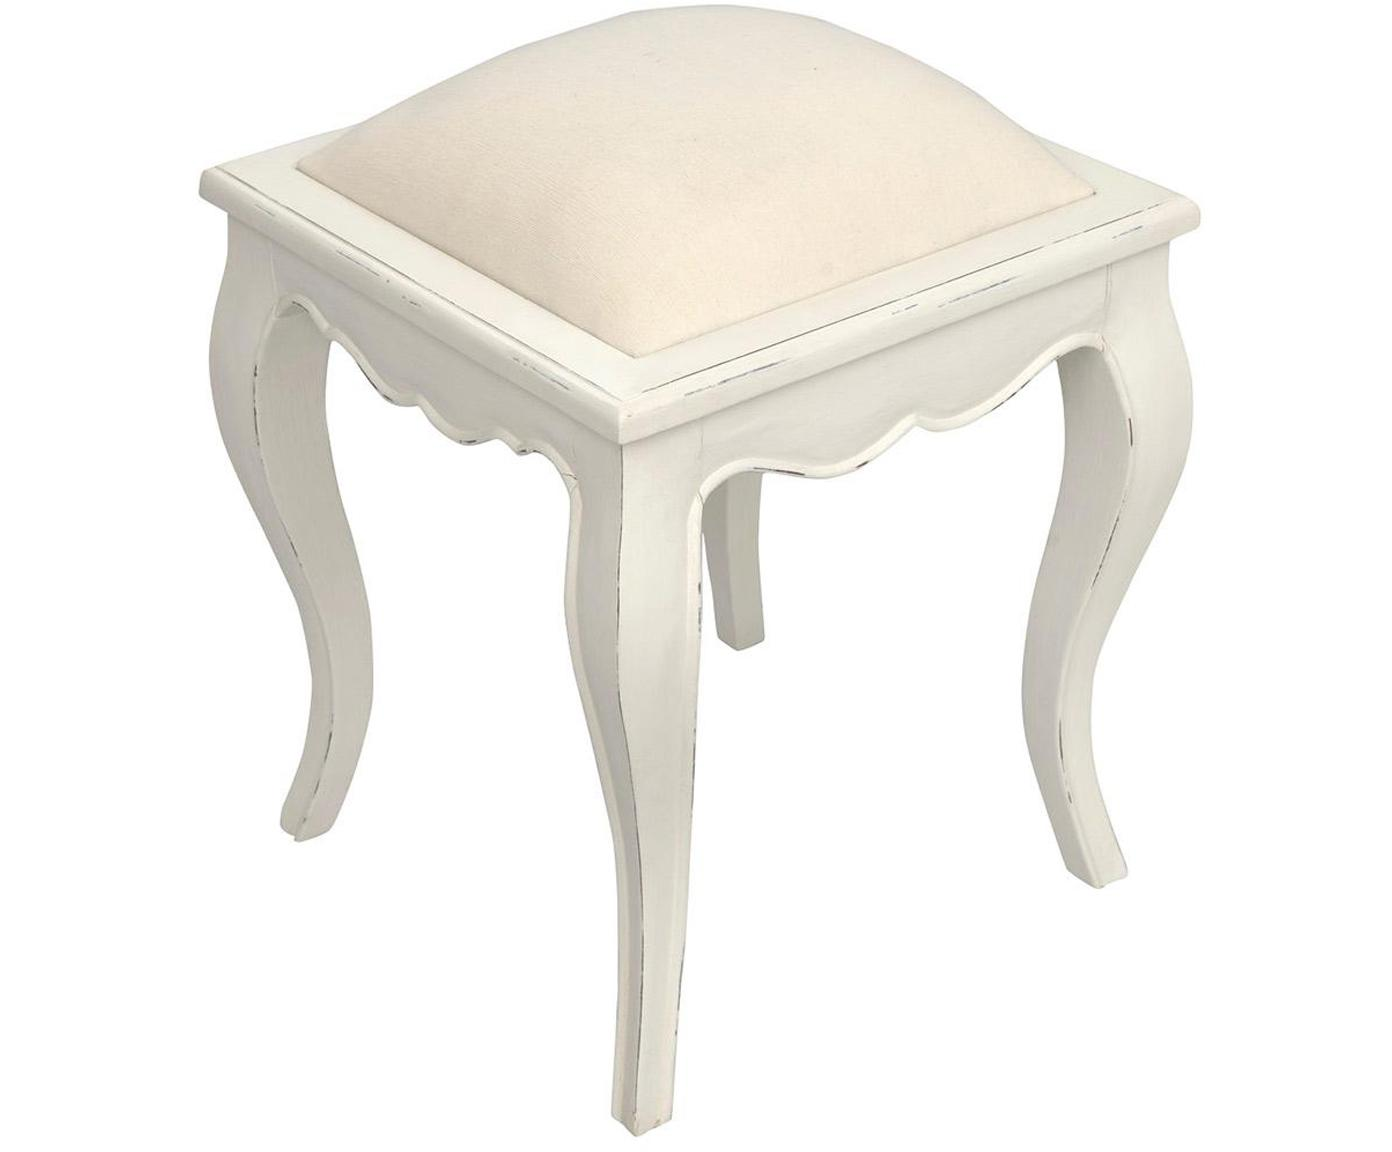 Taburete tapizado Murano, Tapizado: lino, Blanco, An 40 x Al 46 cm